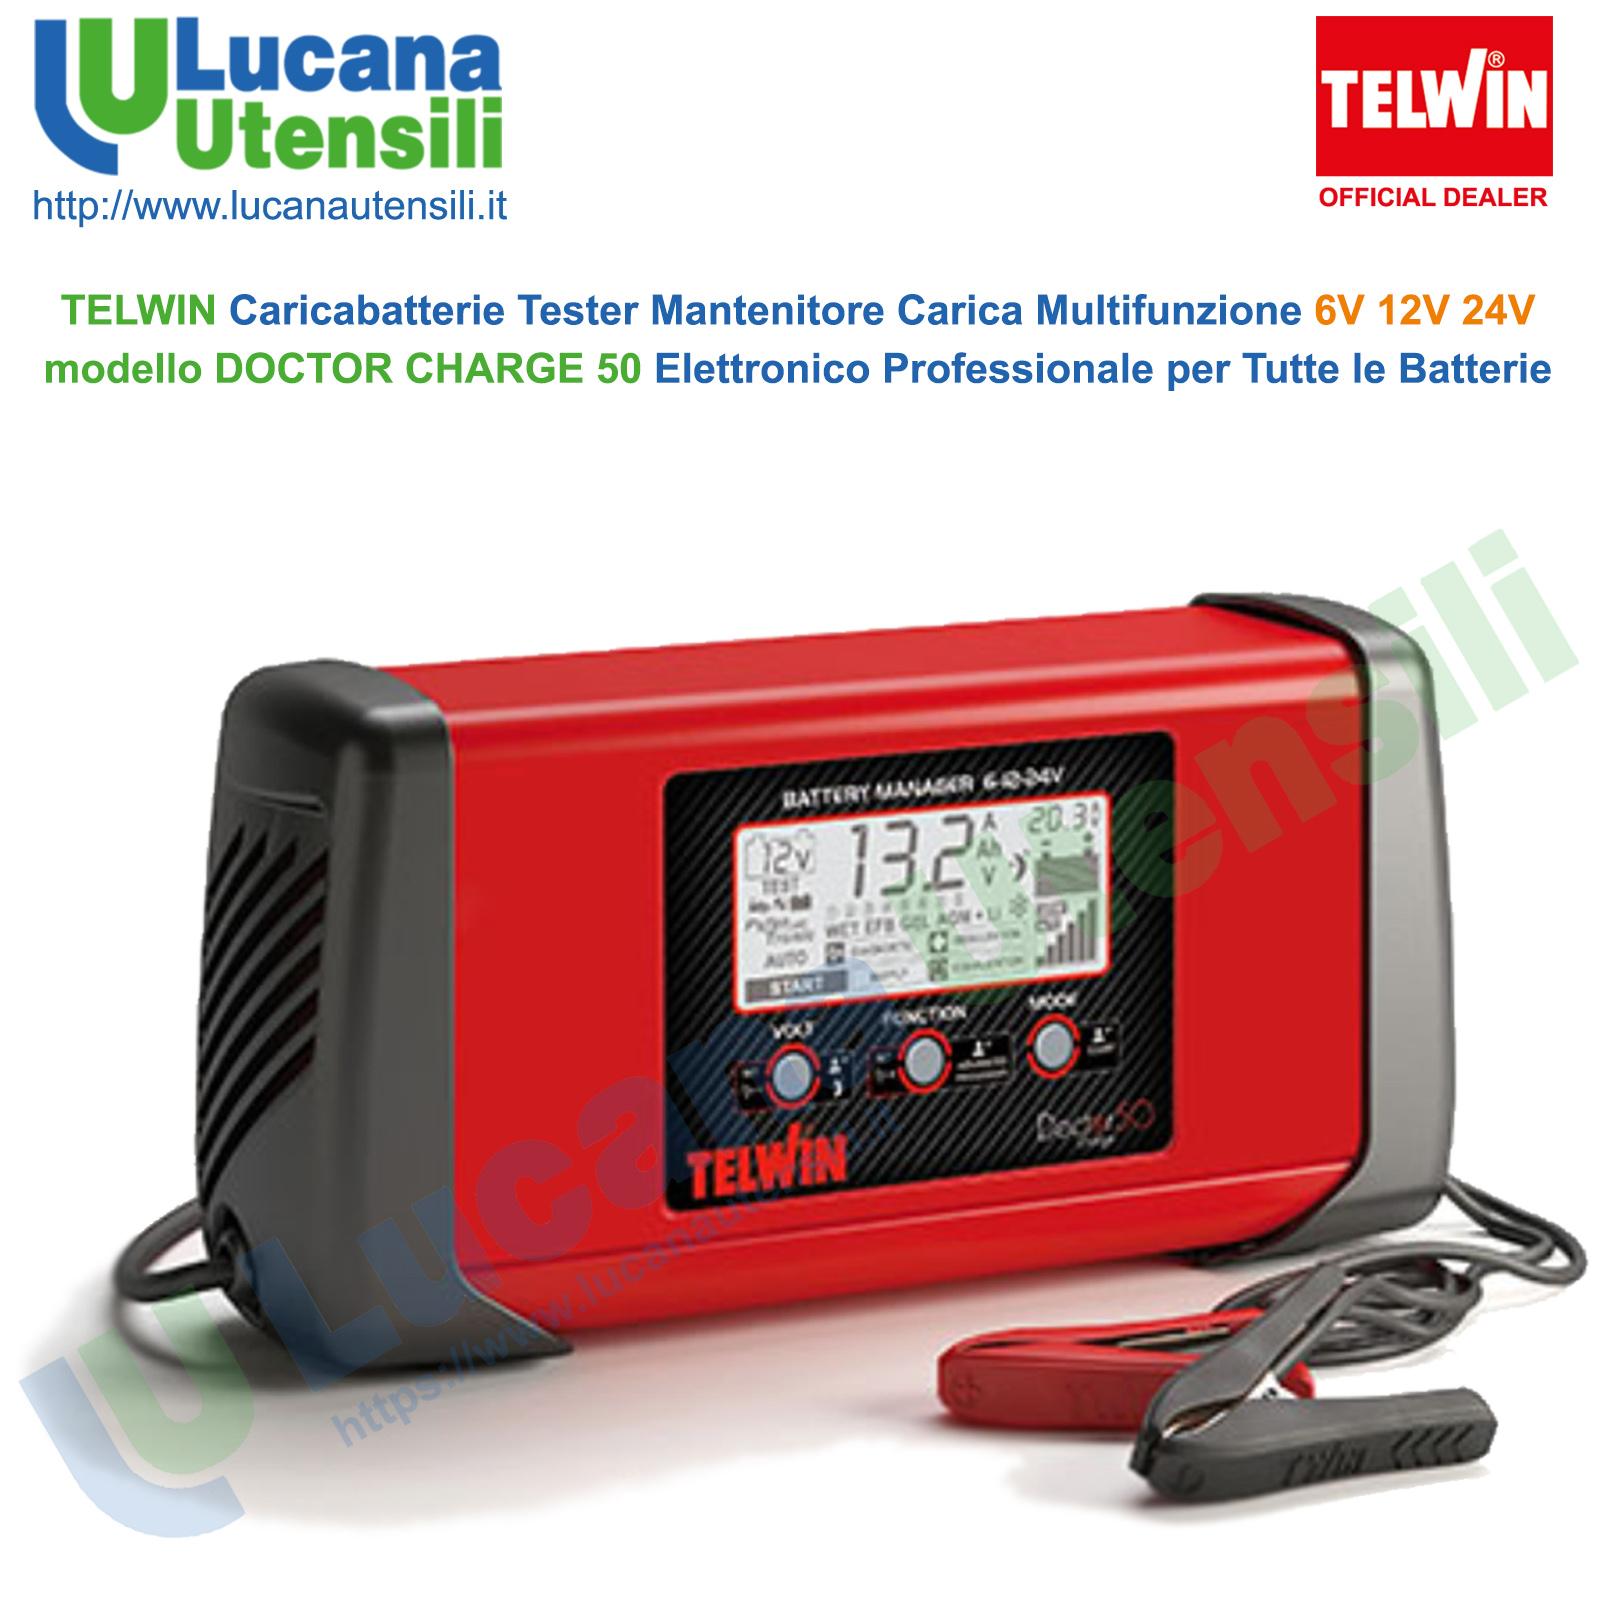 TELWIN DOCTOR START 630 230V 12V//24V CARICABATTERIE ELETTRONICO MULTIFUNZIONE